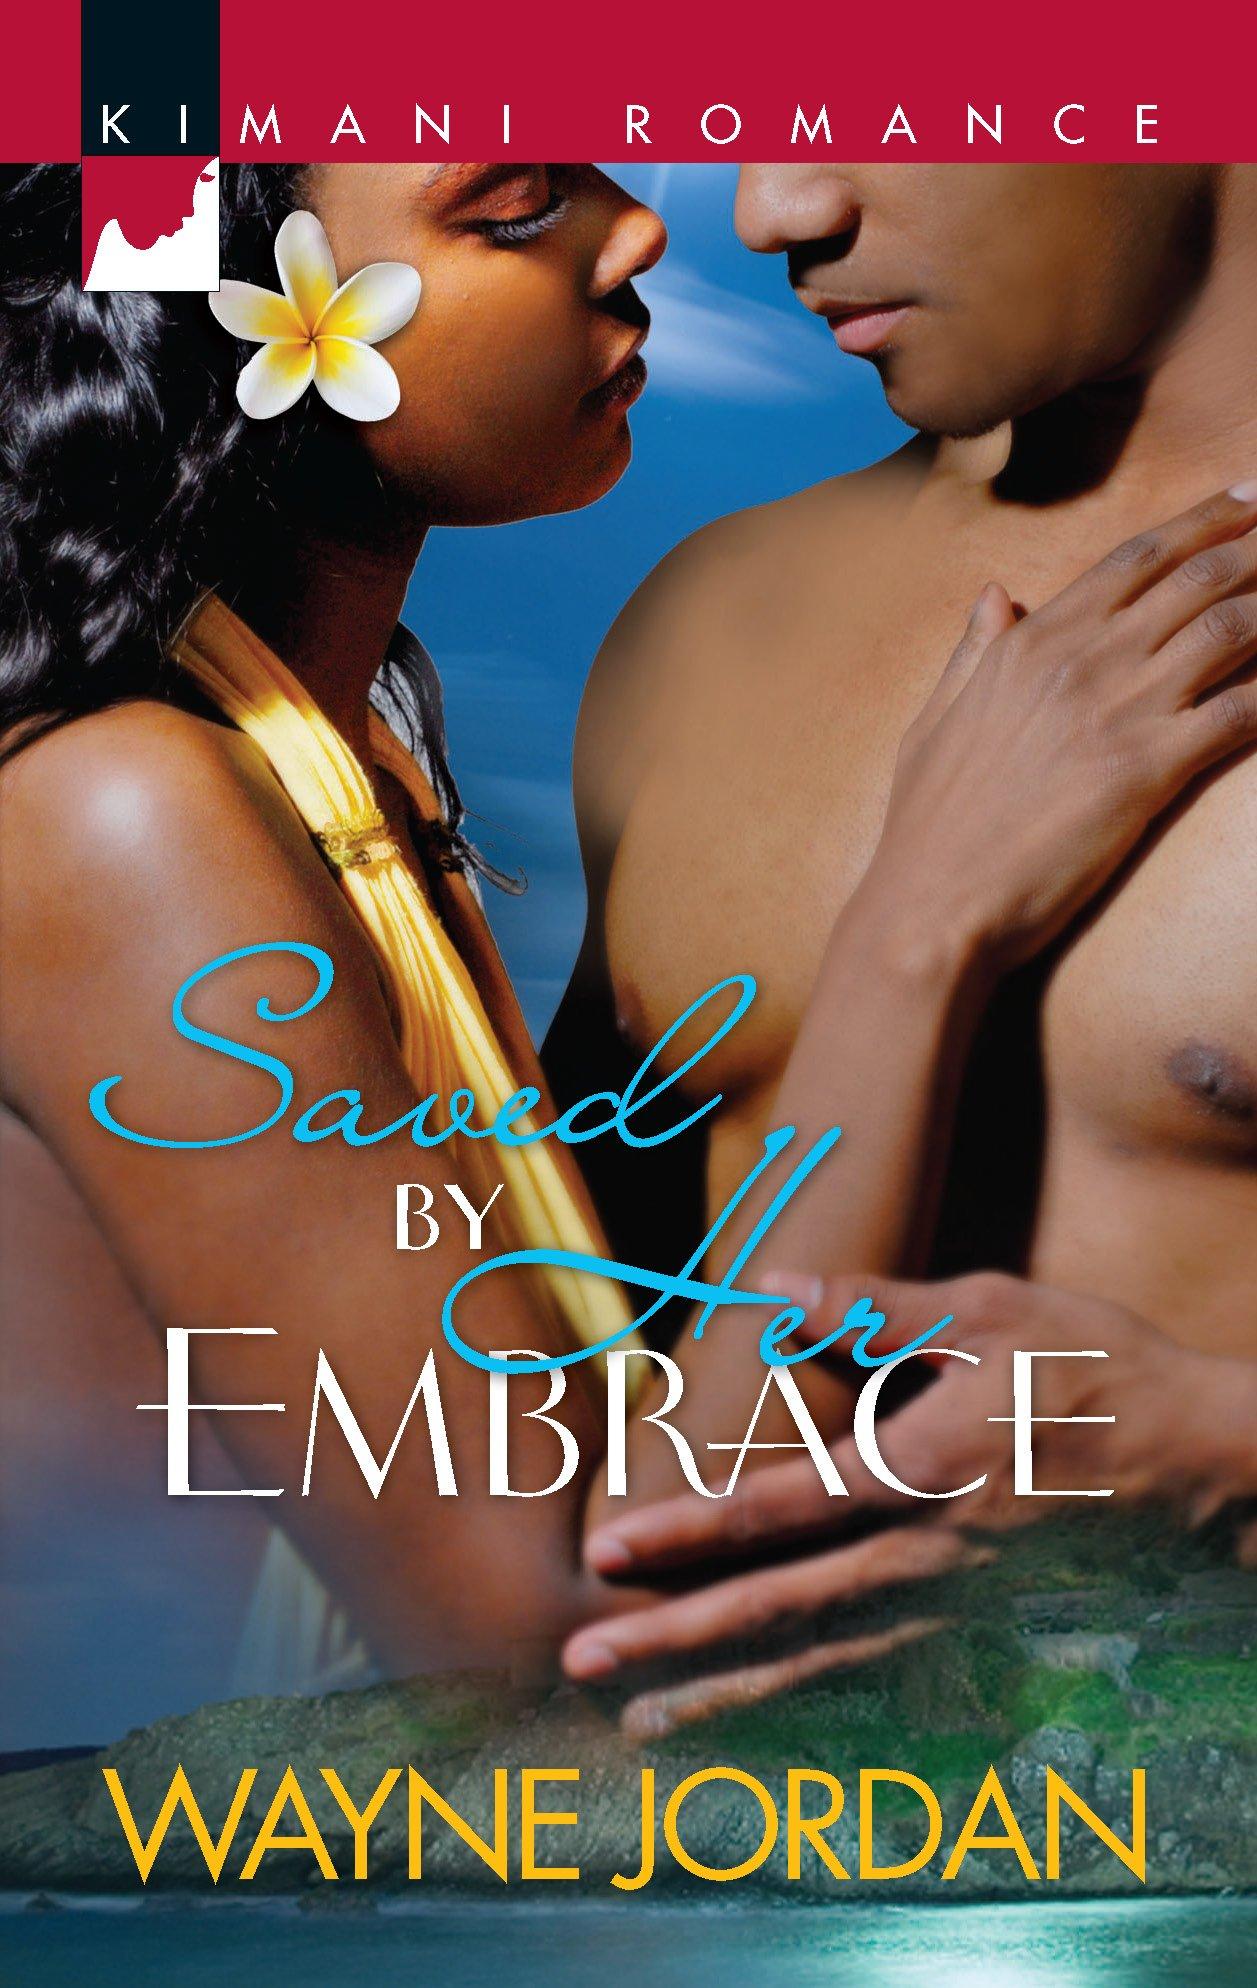 Amazon.com: Saved by Her Embrace (Kimani Romance) (9780373862191): Wayne  Jordan: Books